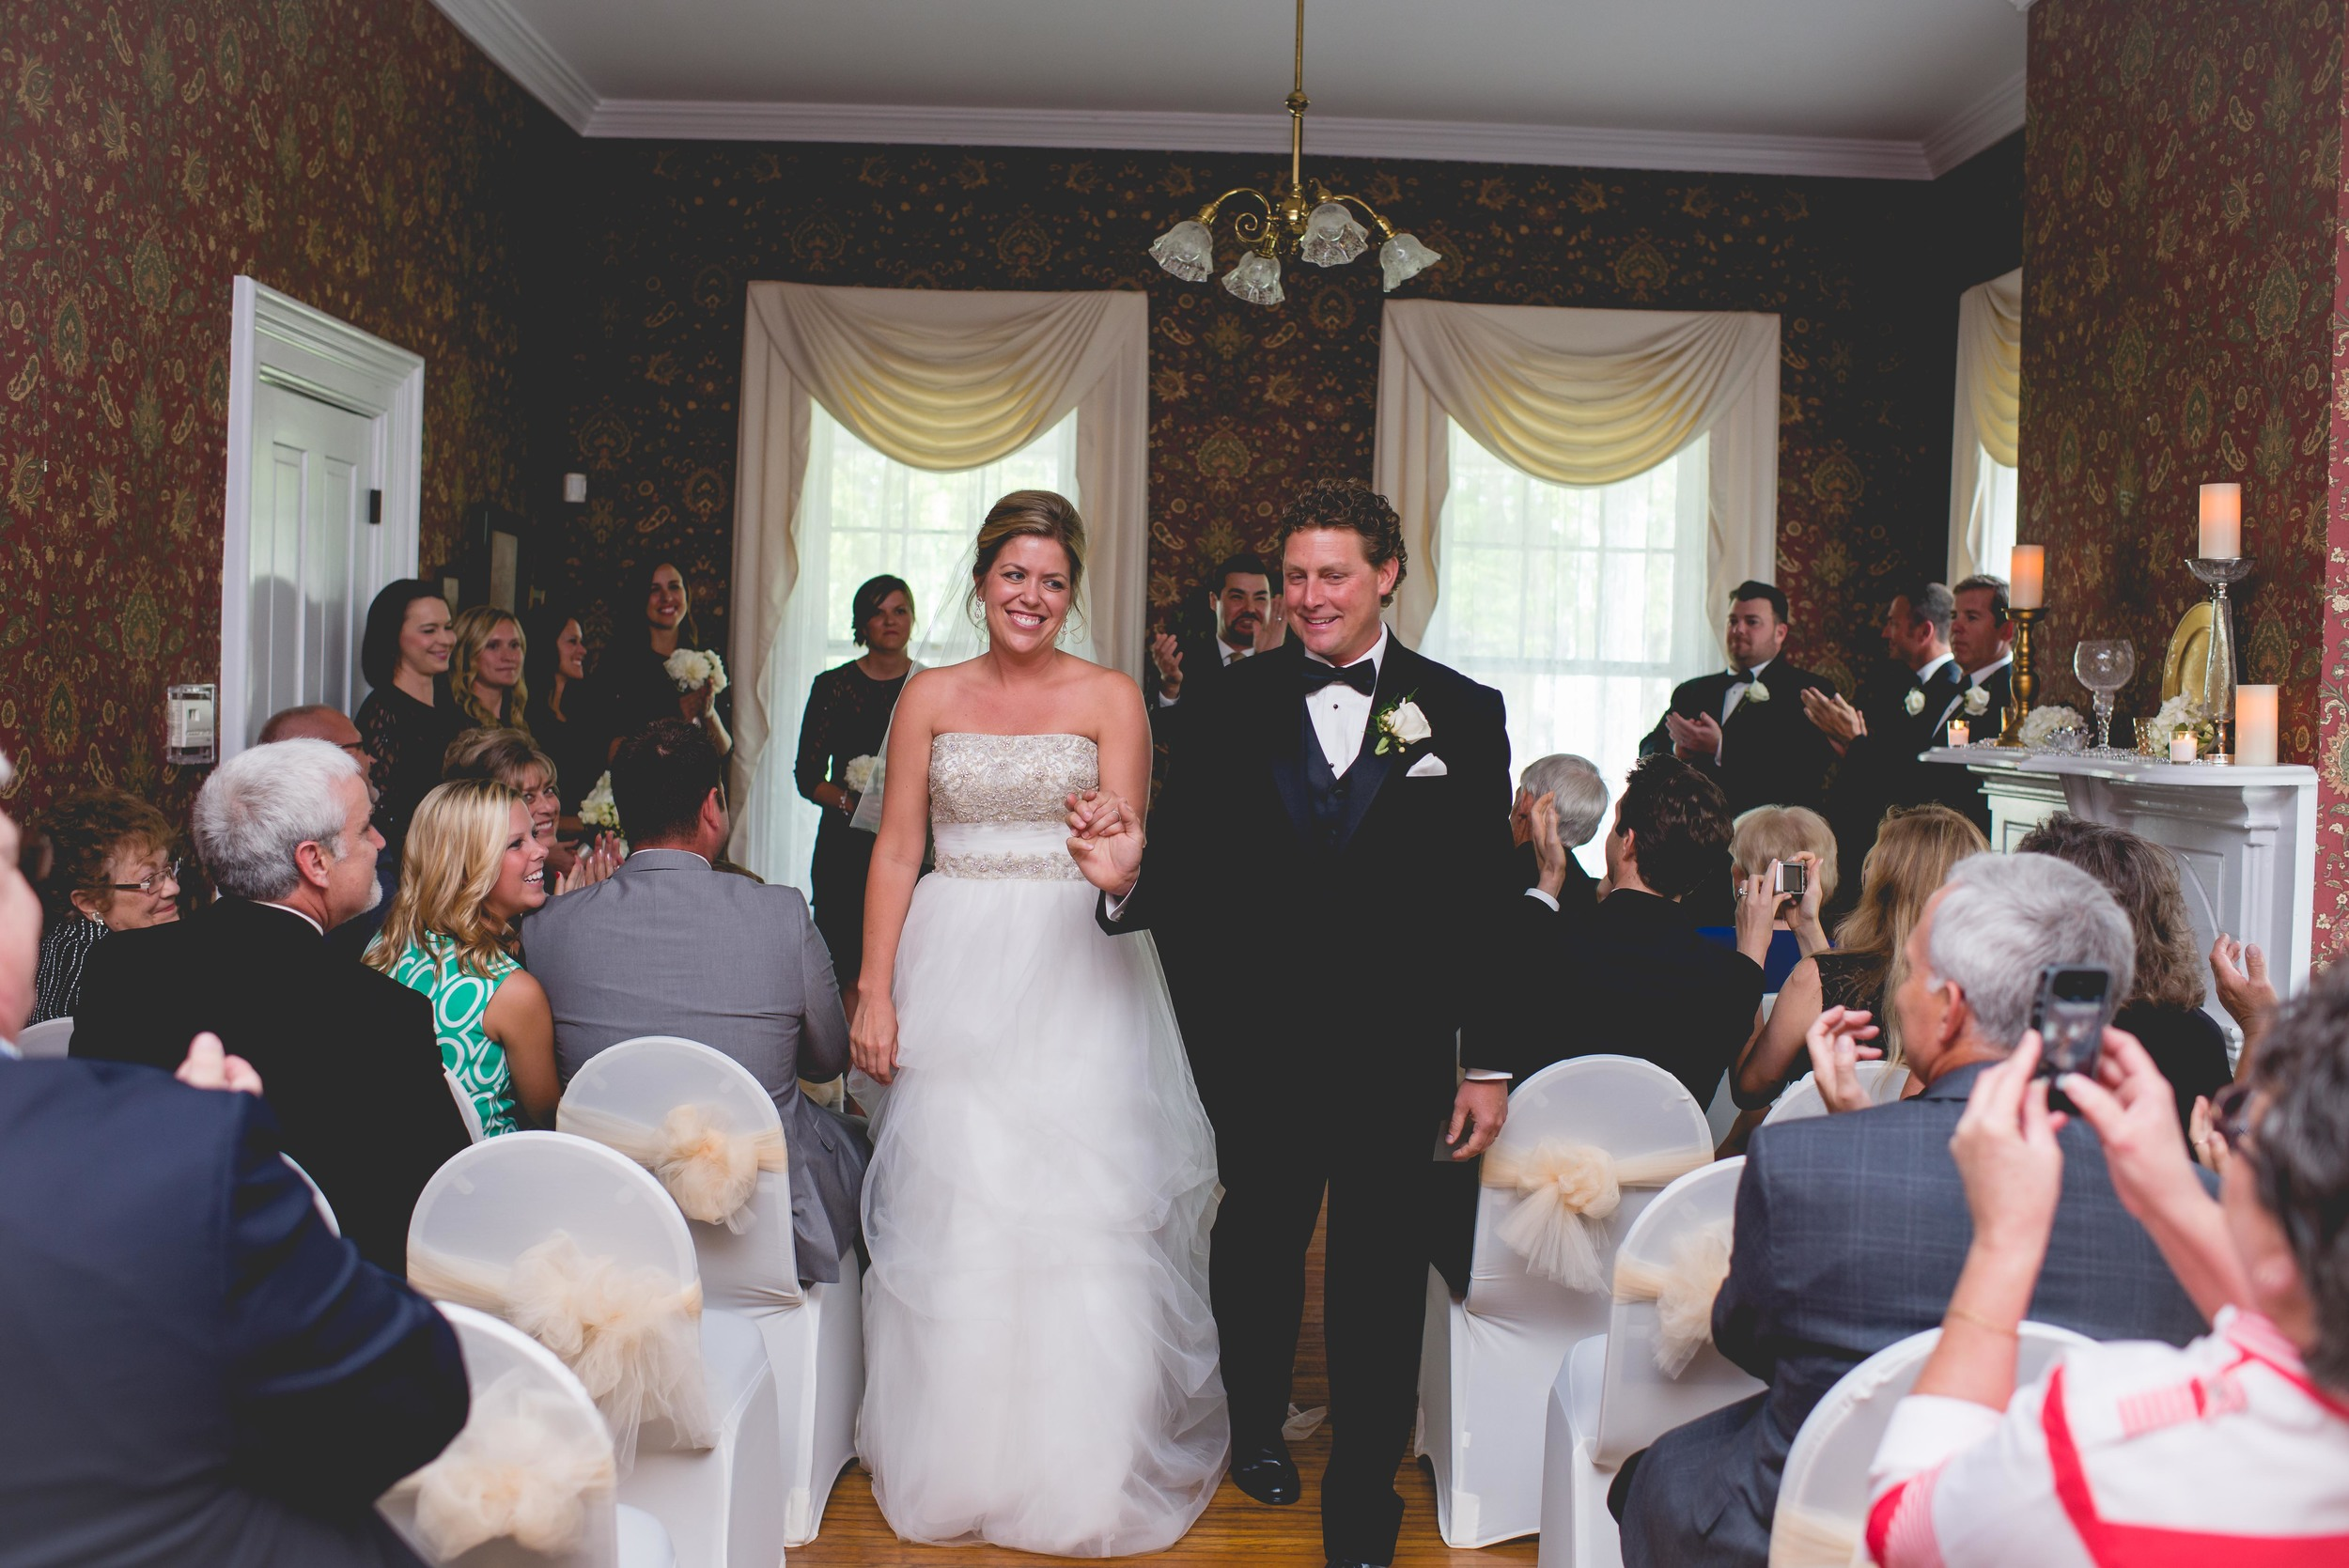 sarasutterphotography_leeandshalon_wedding_2015-400.jpg